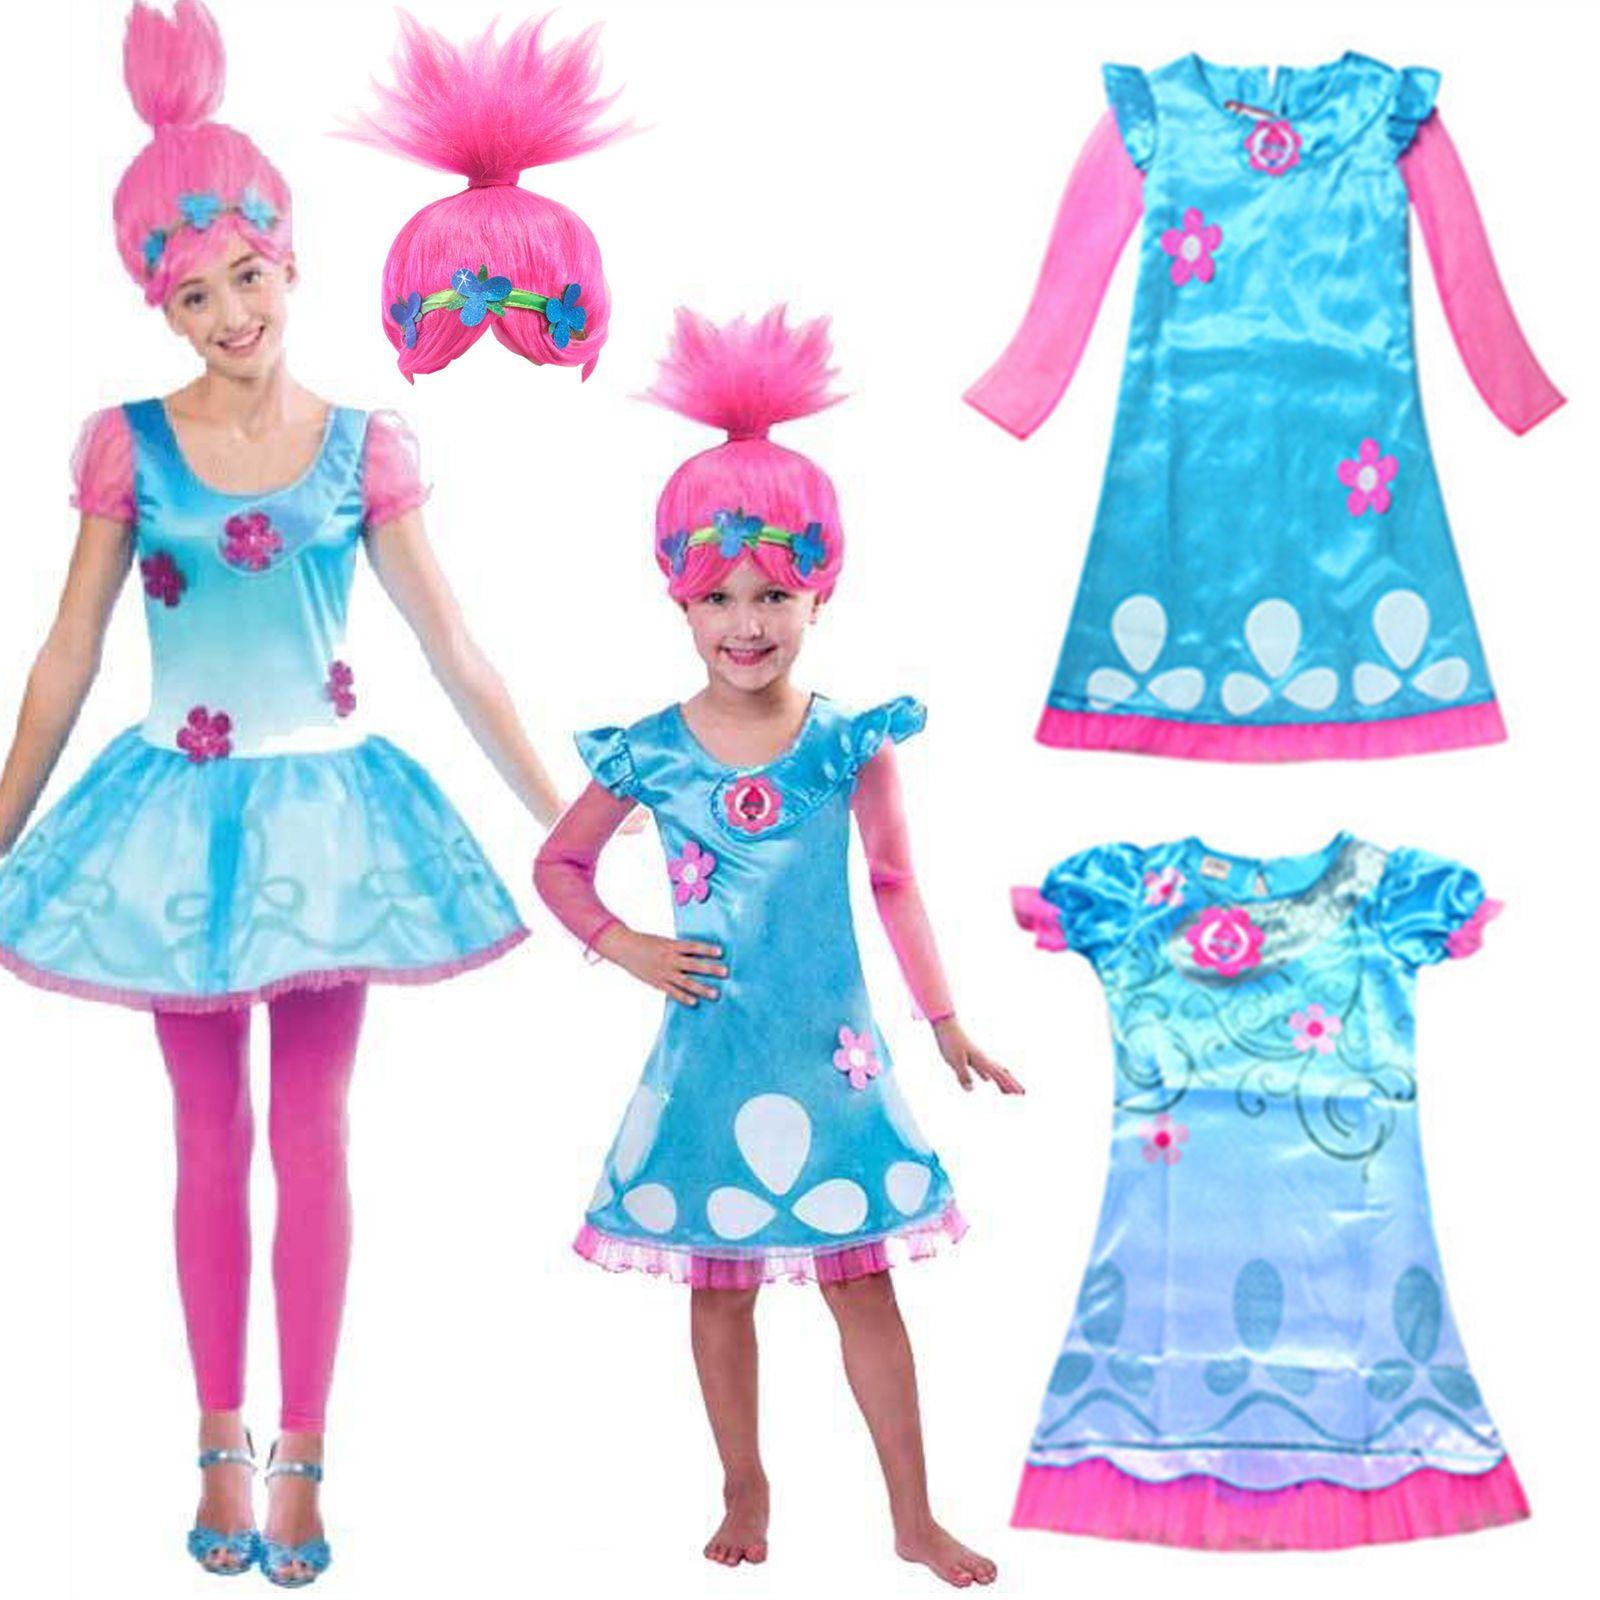 Toddler Kids Girls Wig Trolls Poppy Fancy Dress Costume Cosplay ...